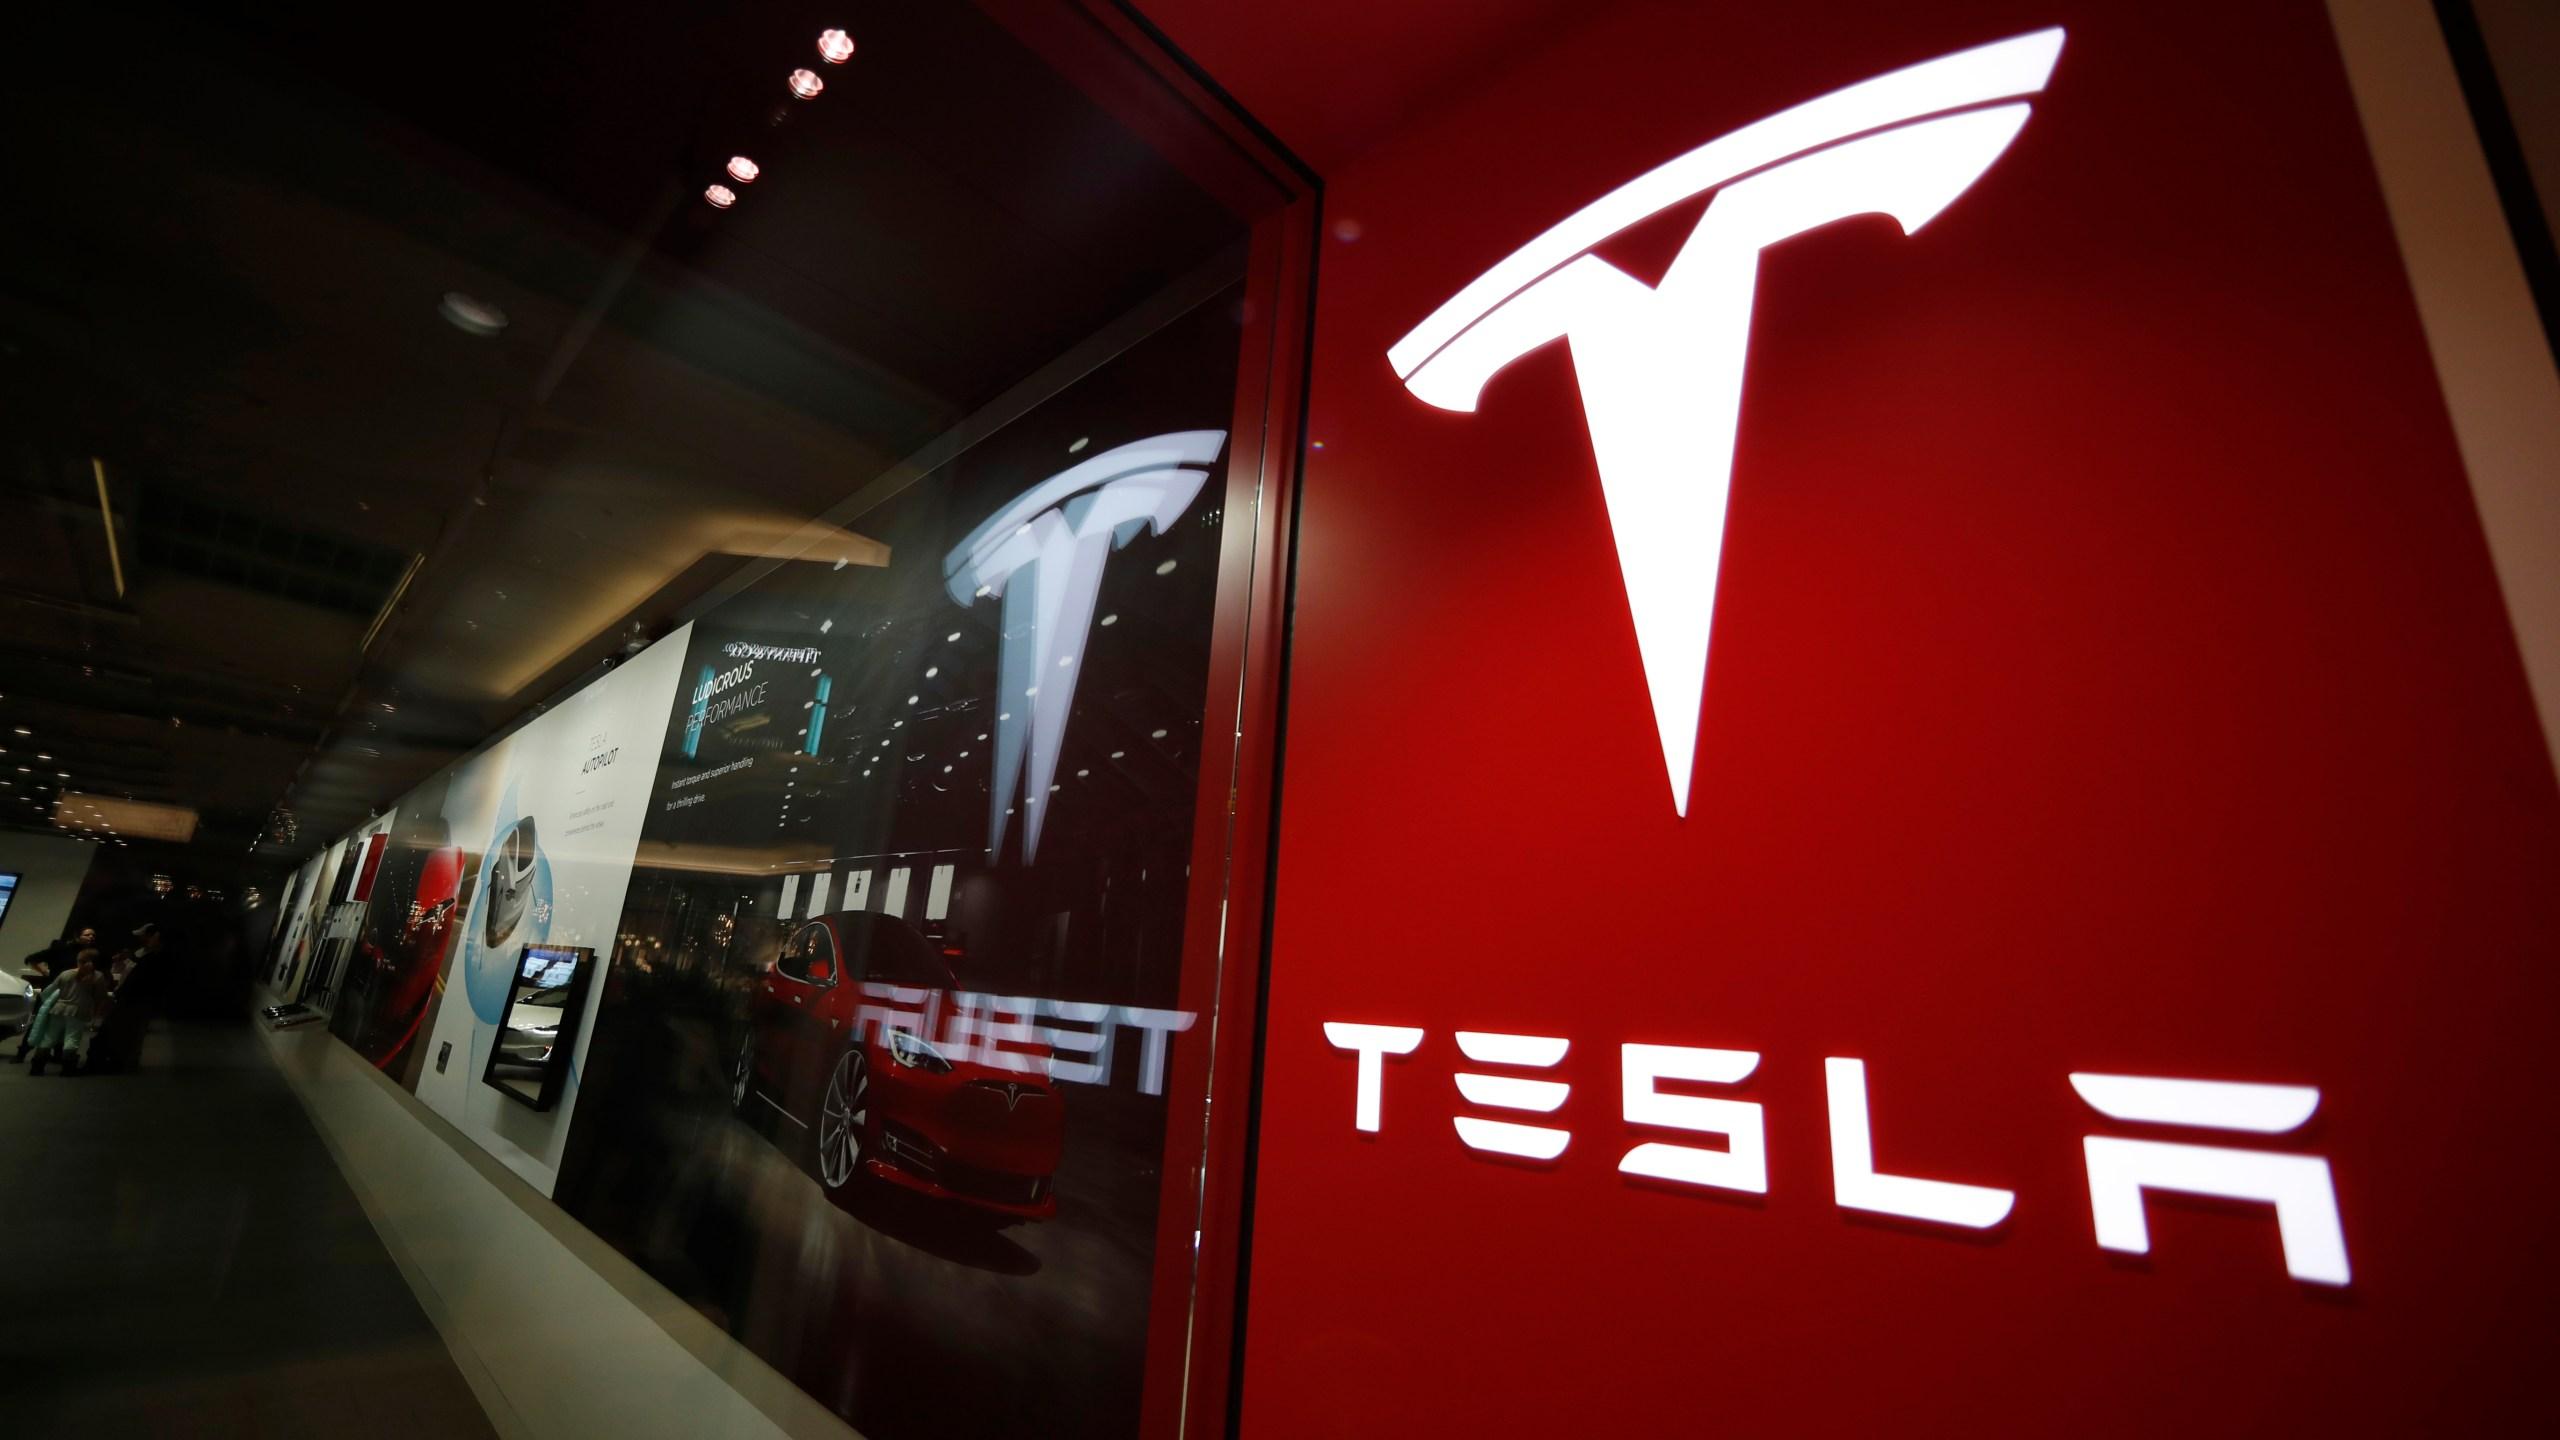 Tesla_Autopilot_09836-159532.jpg01451161